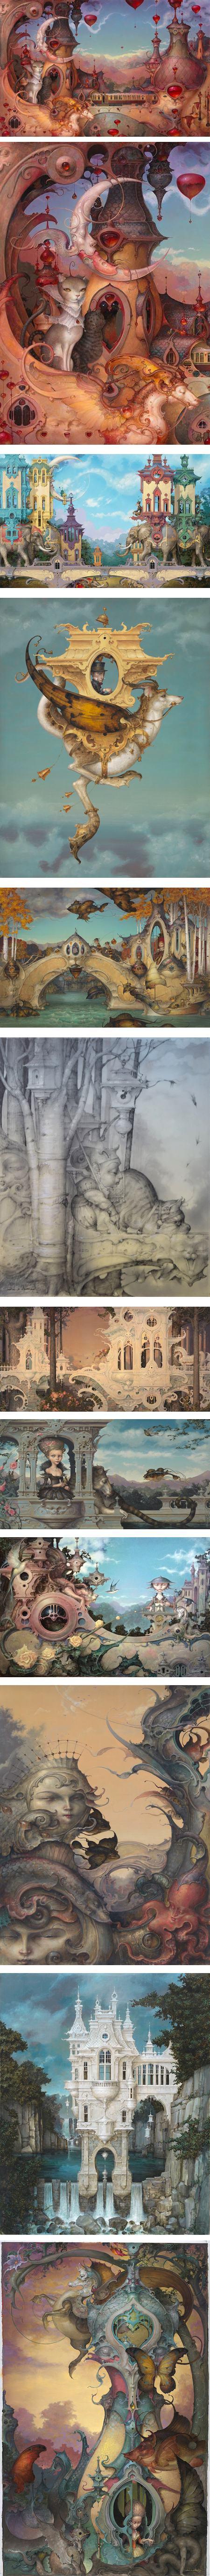 David Merriam, fantastical architectural dreamscapes